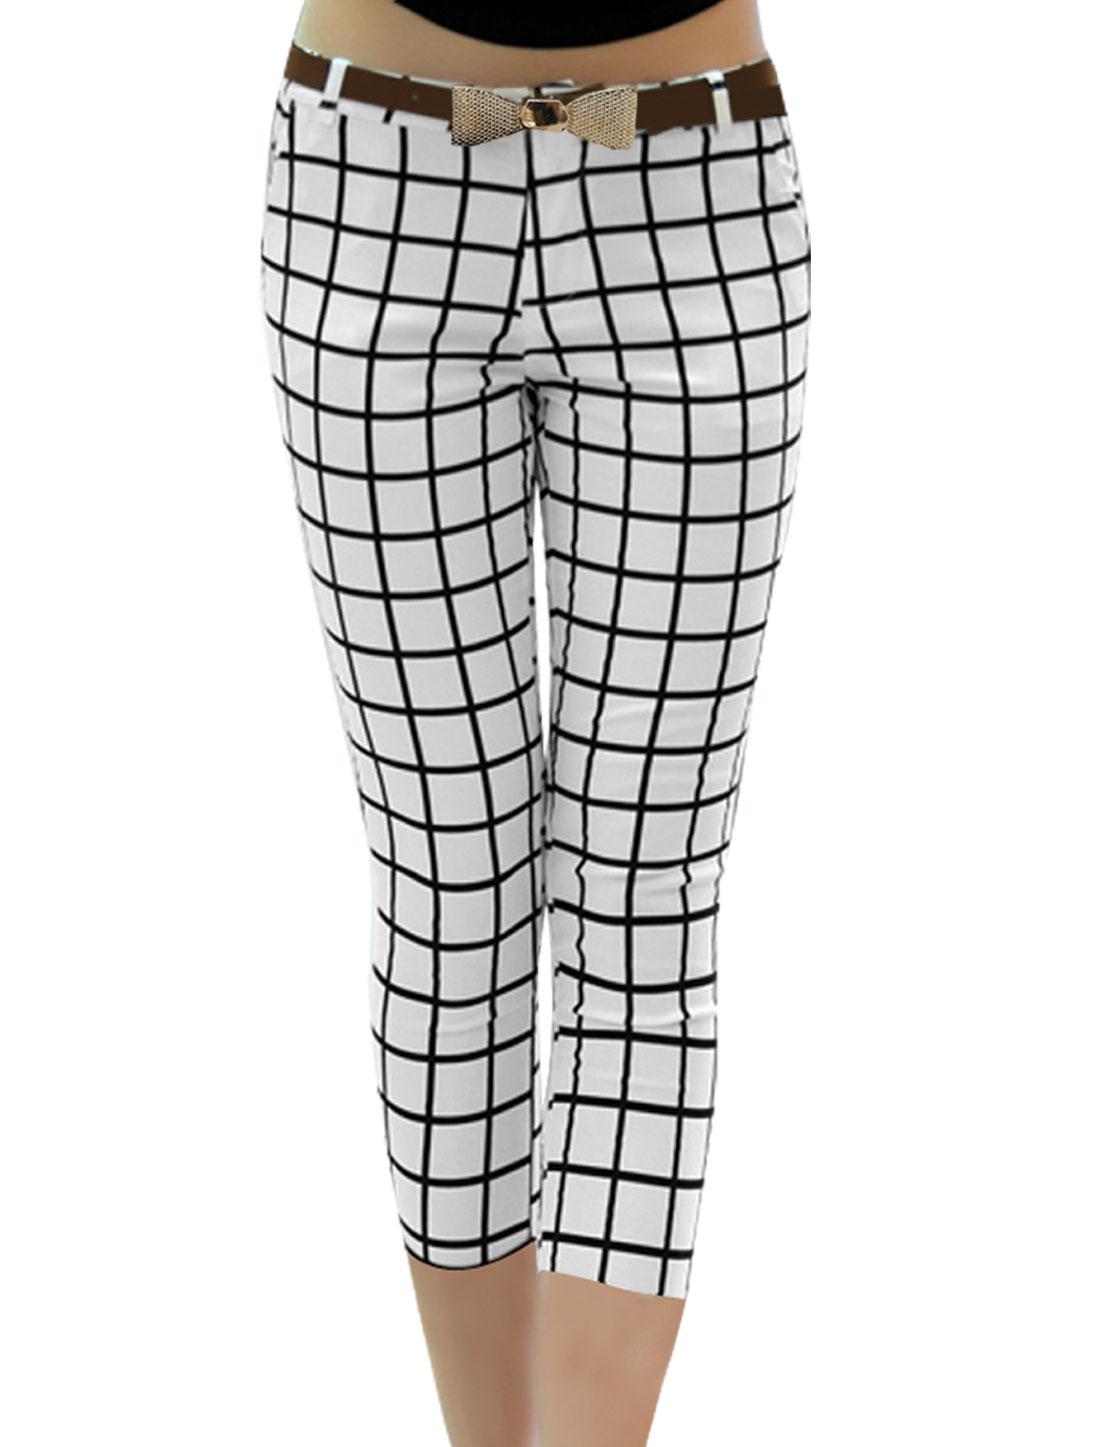 Lady Fashion Belt Loop Waist Stretchy Plaids Prints White Black Pants XS